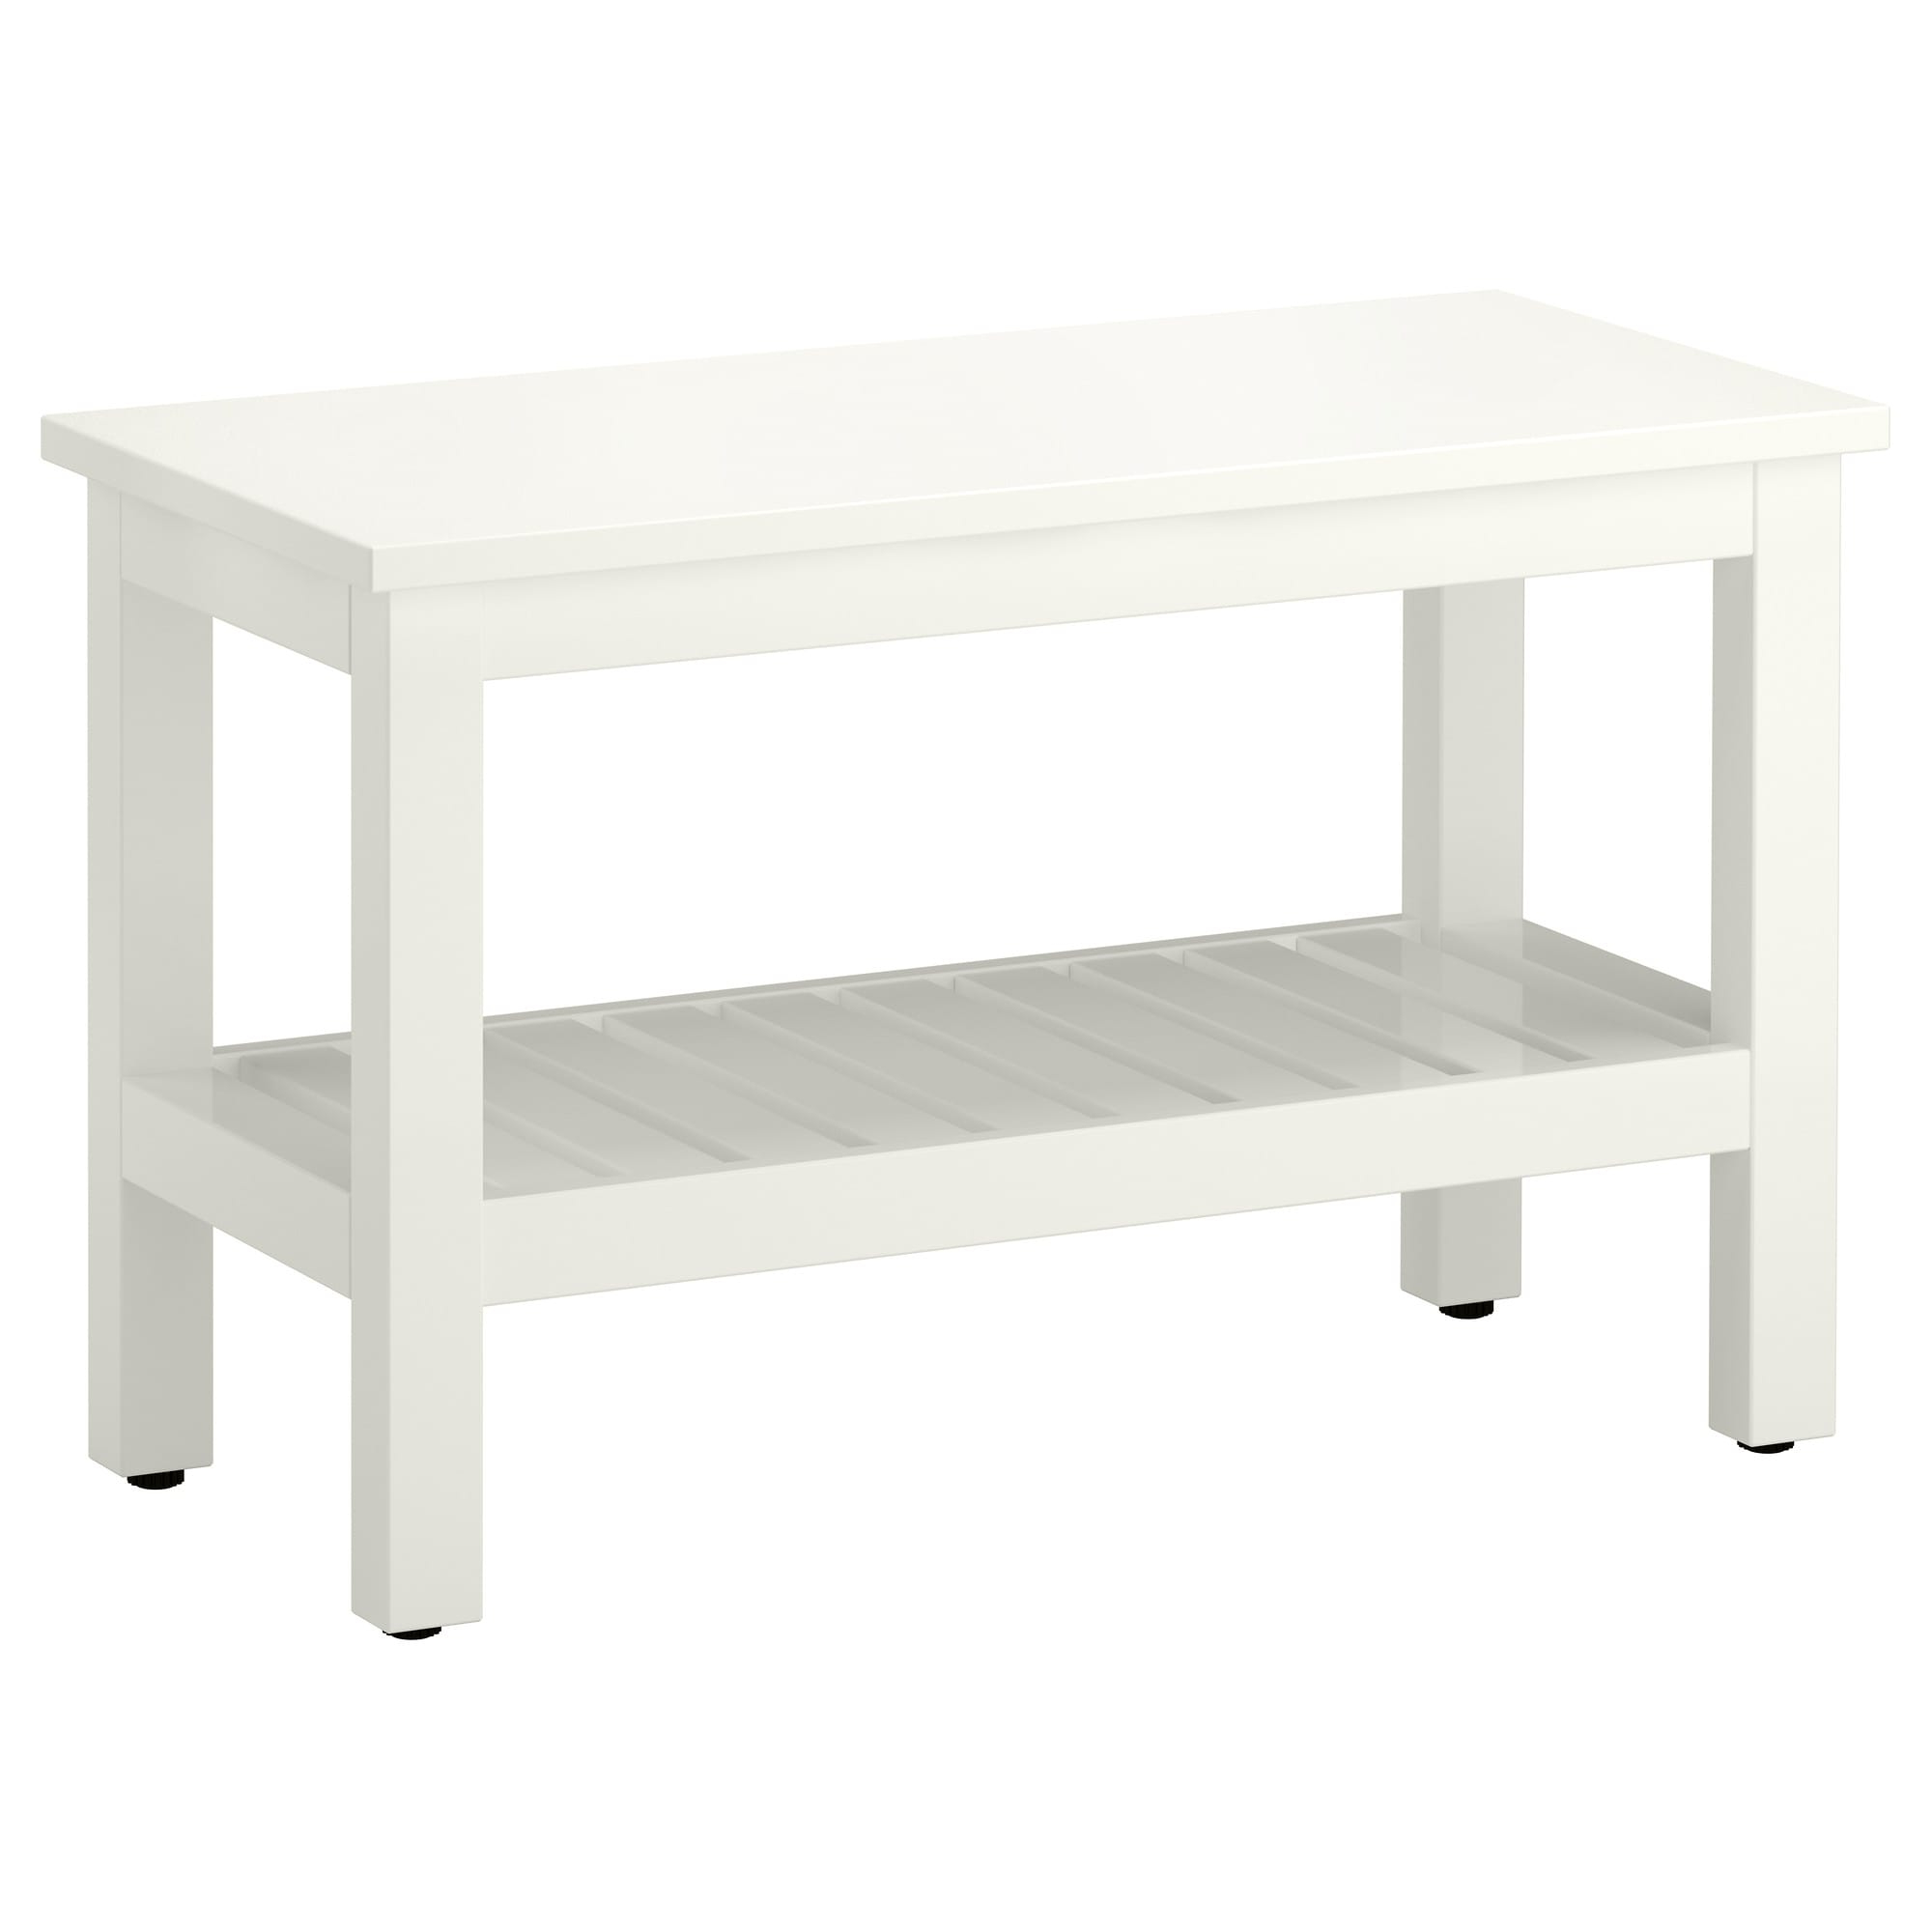 Banco Blanco Dddy Hemnes Banco Blanco 83 Cm Ikea